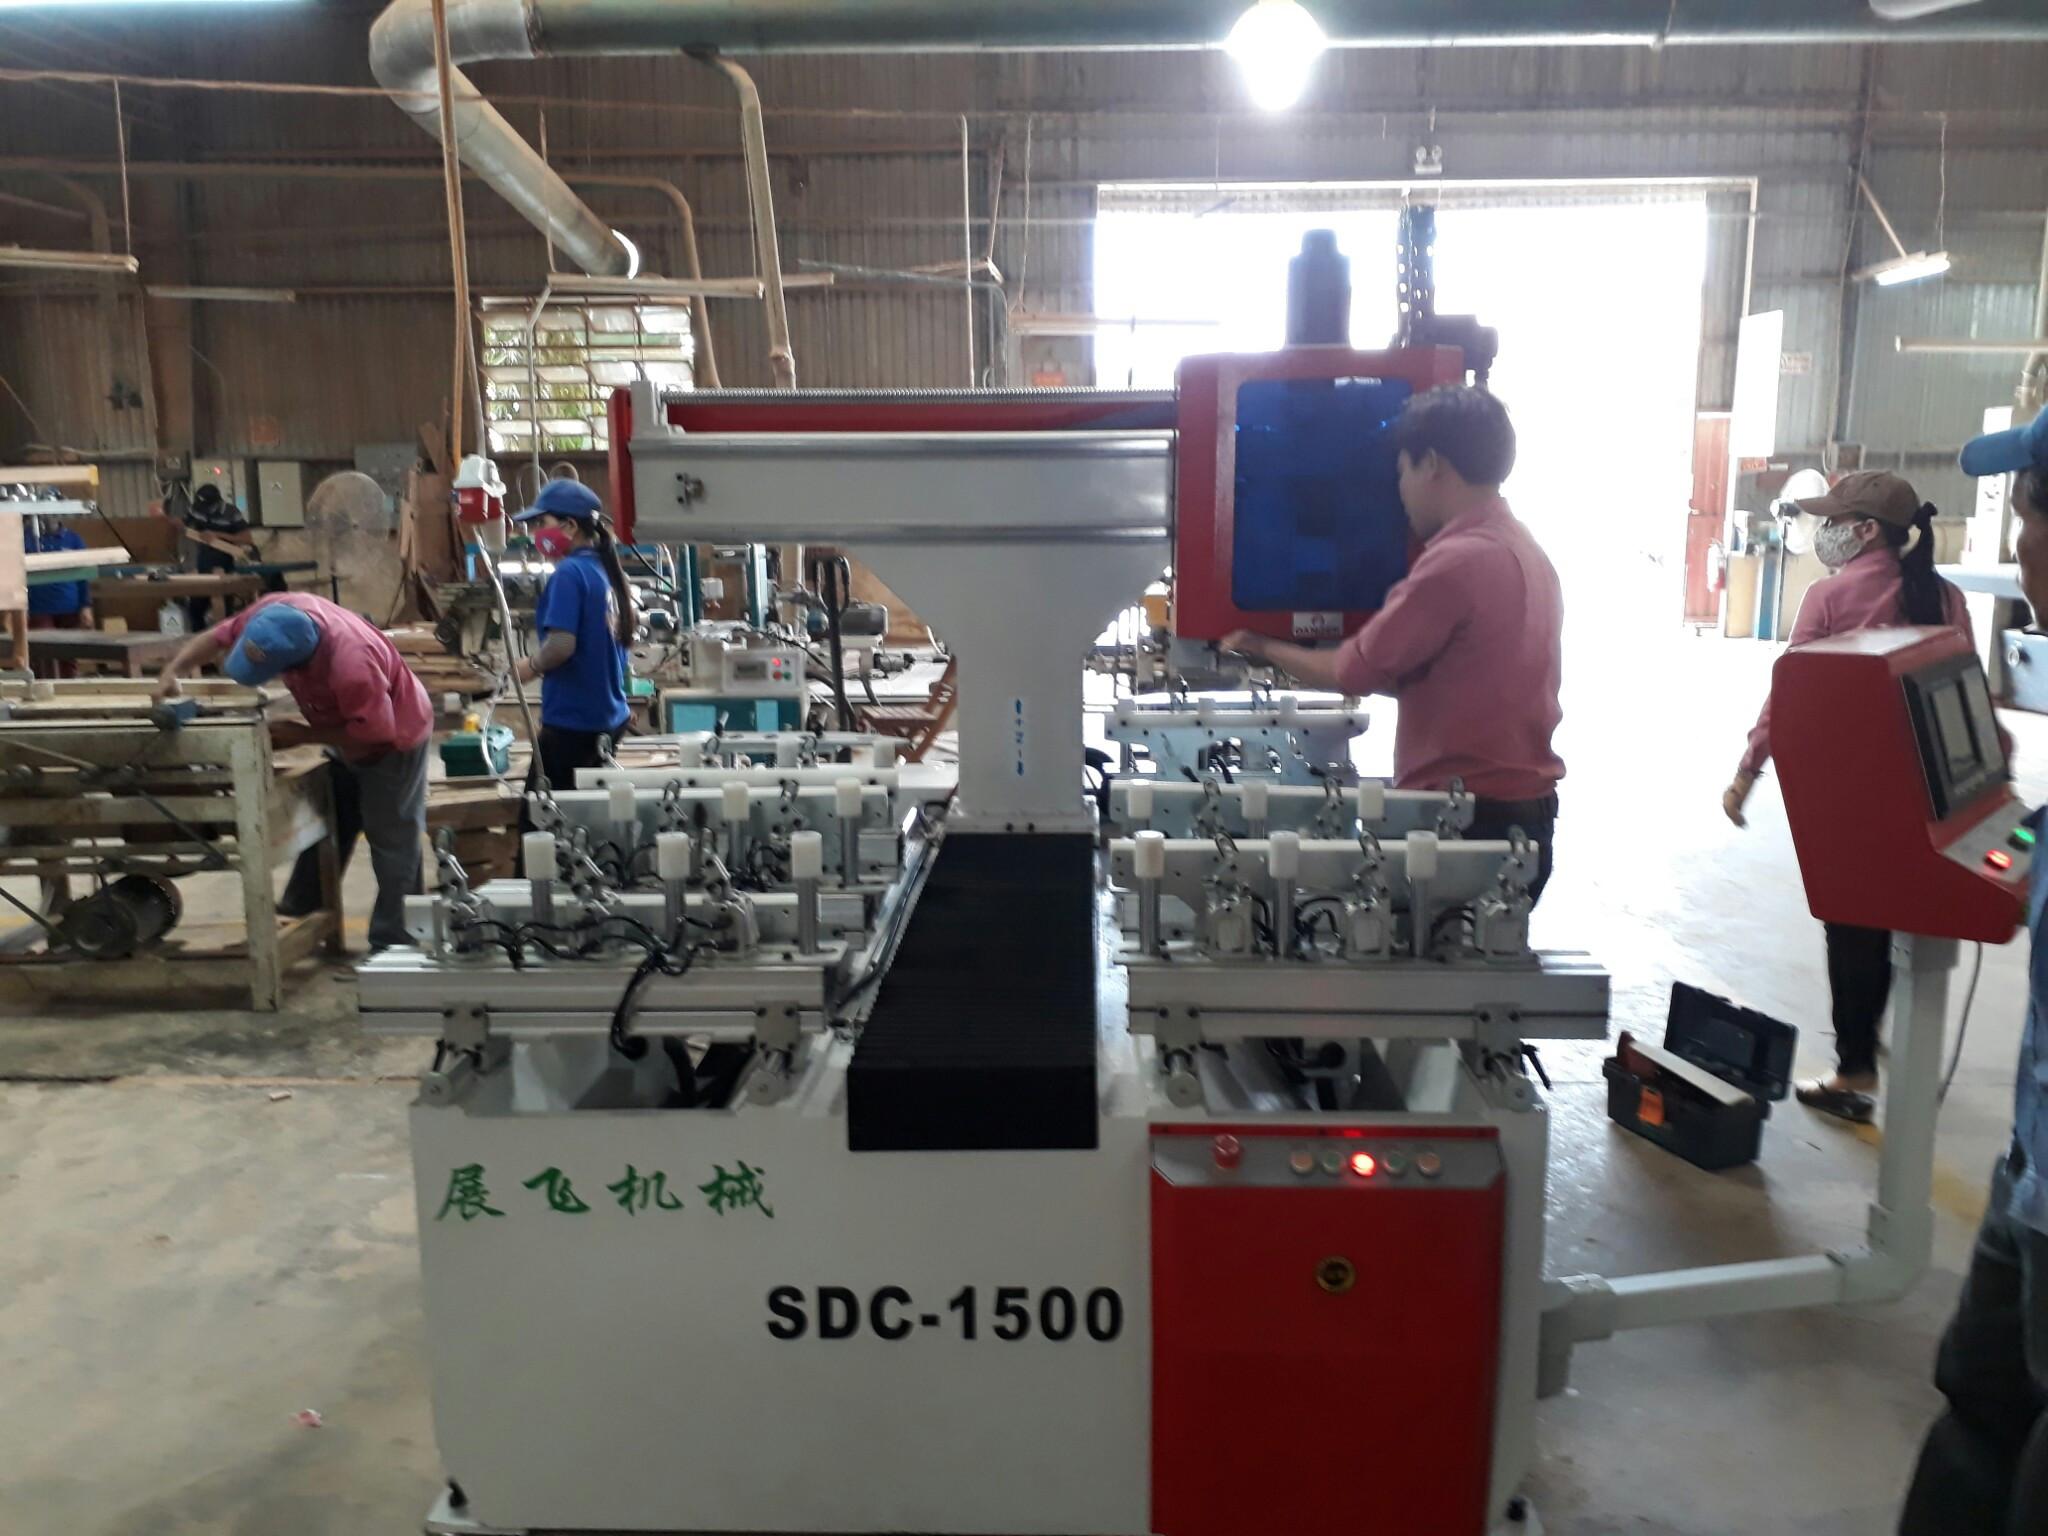 sdc-1500